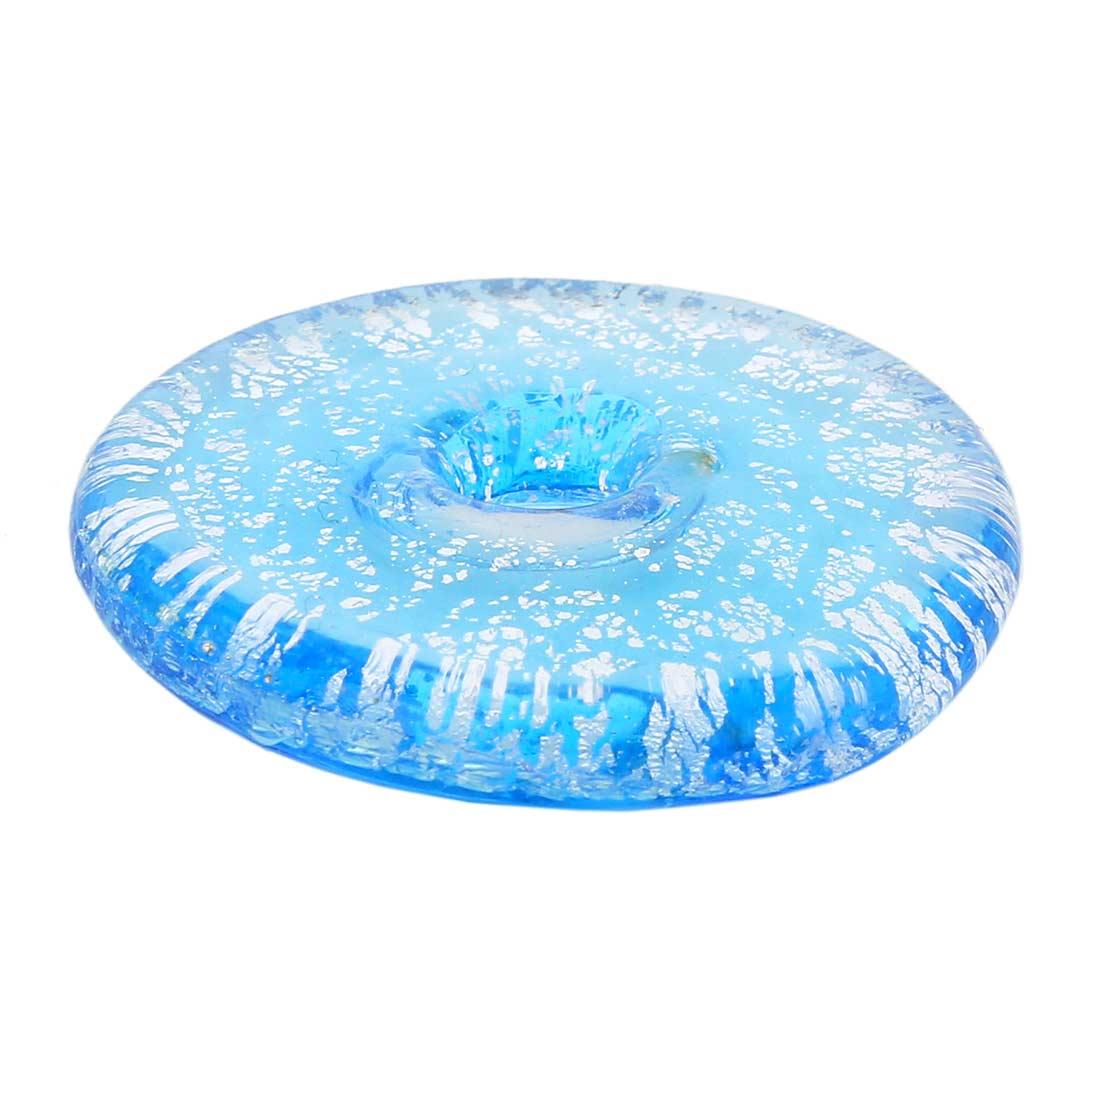 Silver Rain bagel pendant - Aqua